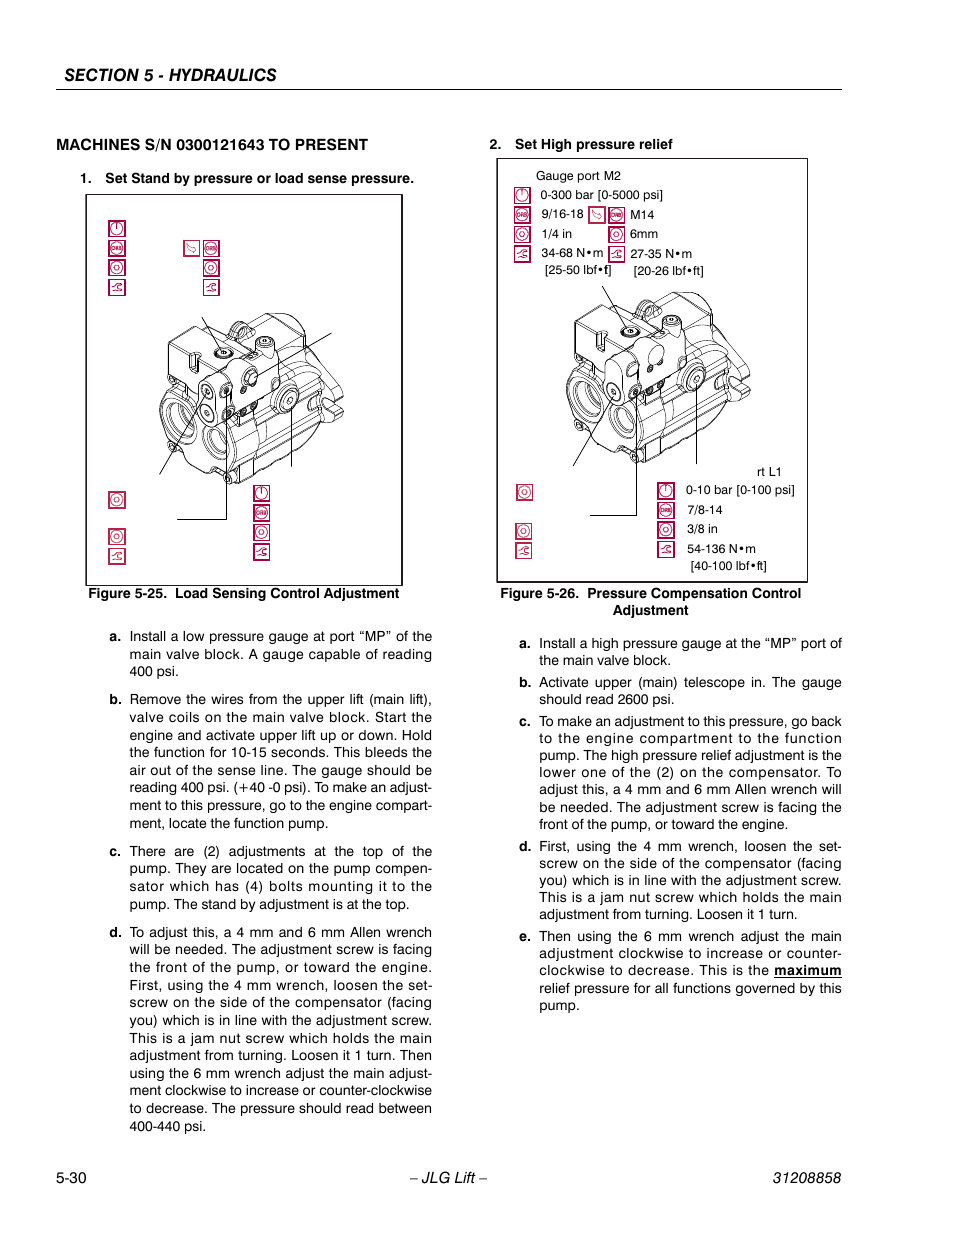 M14 manual load sensing control adjustment 30 pressure compensation control adjustment 30 jlg 800a aj service manual user fandeluxe Gallery